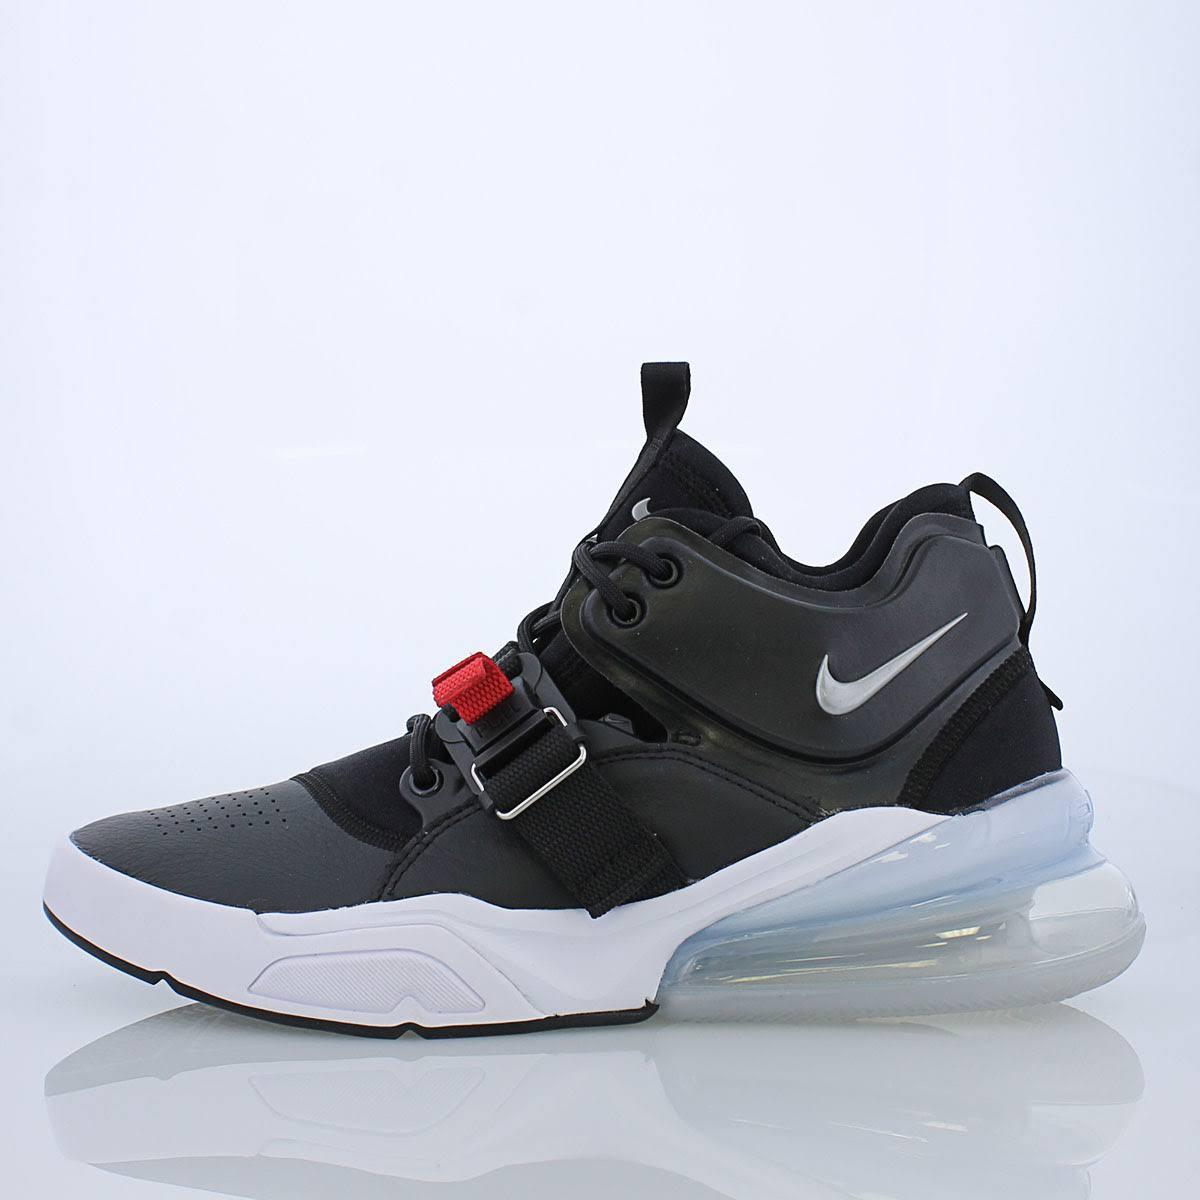 Nike Force Shoes Ah6772001 270 13 Size Mens Air rqxw4Fr